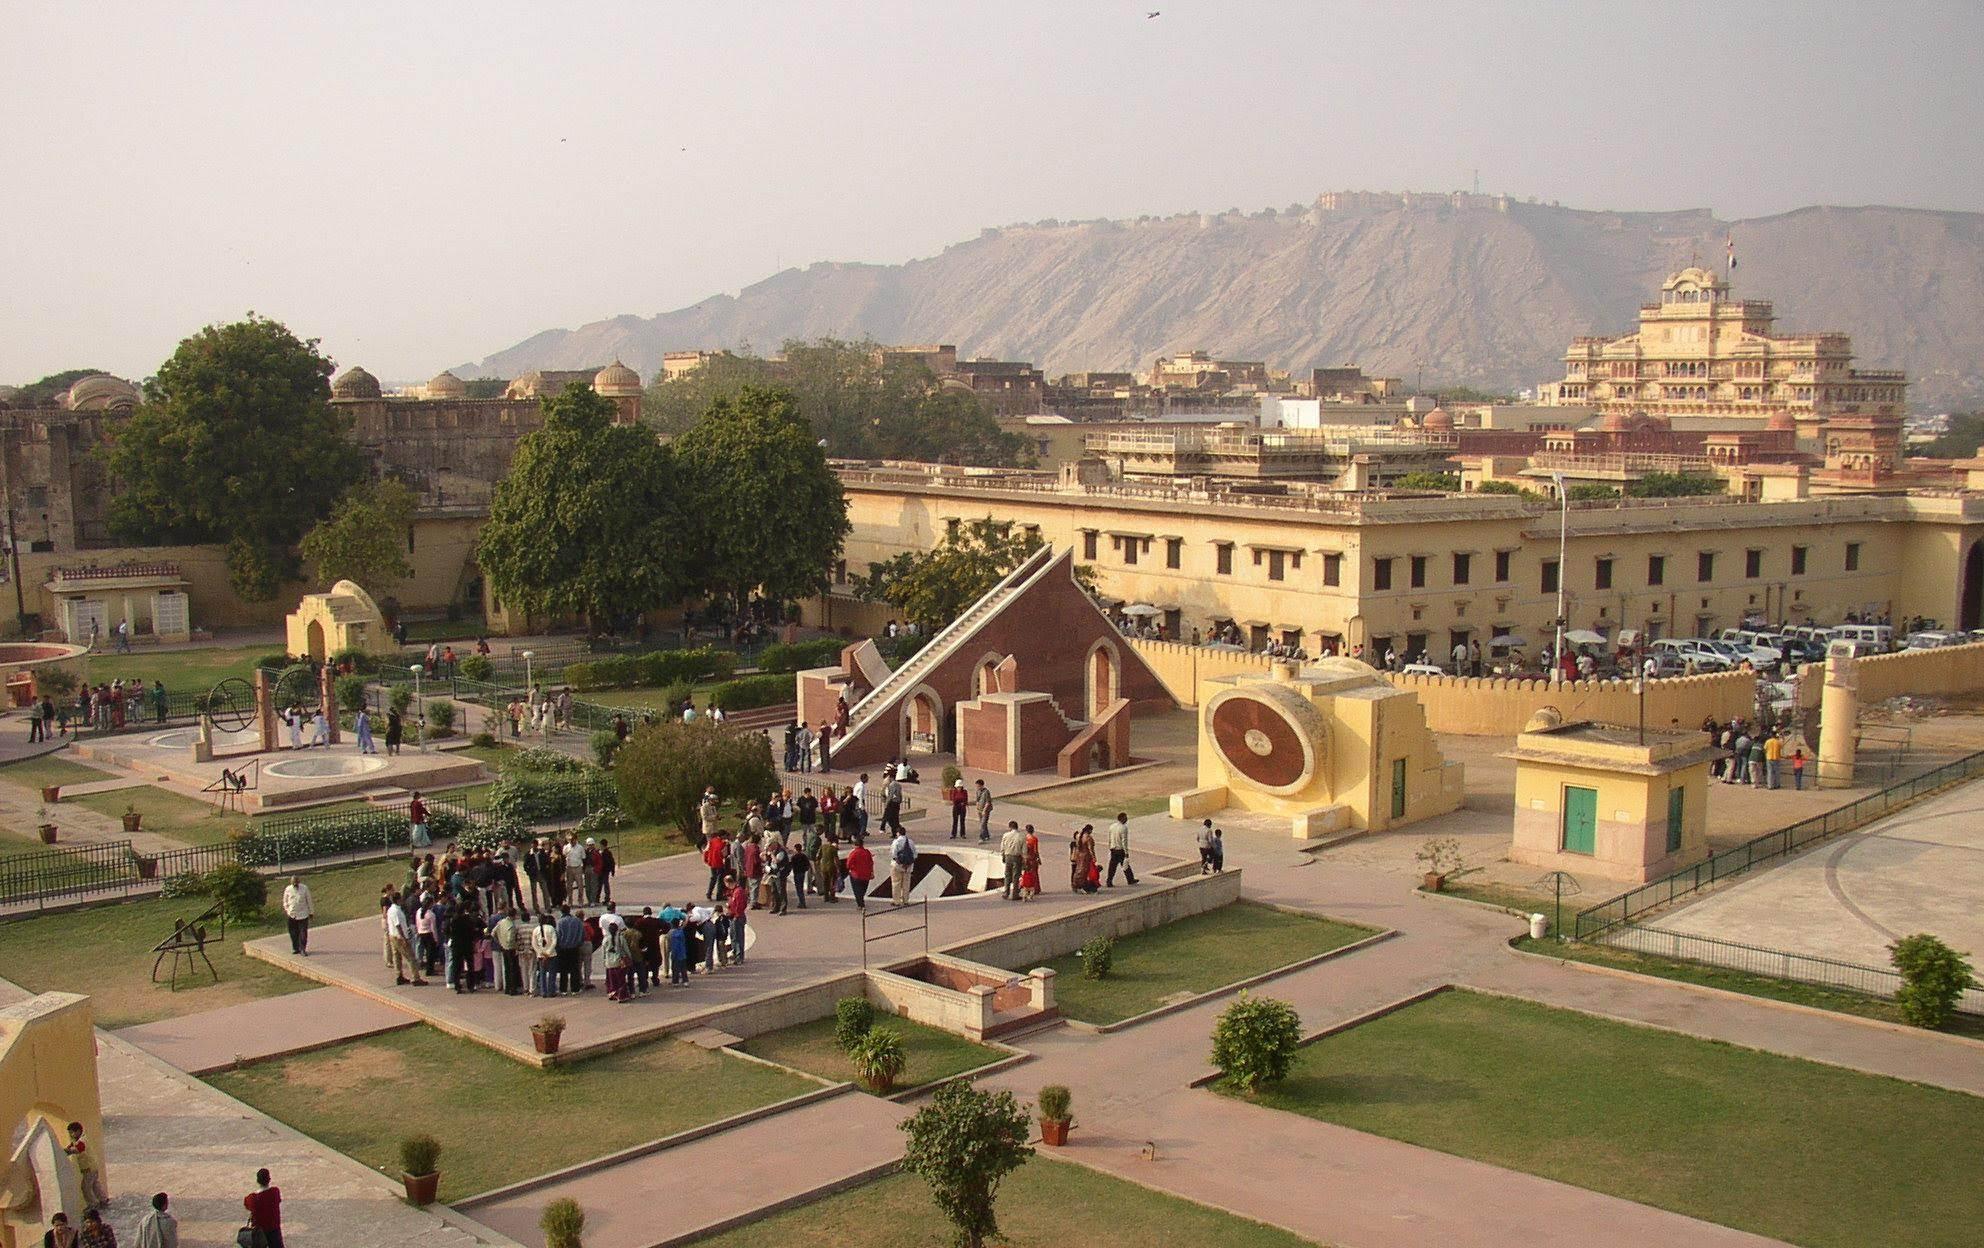 Jantar Mantar (Jaipur), Monuments of India Images